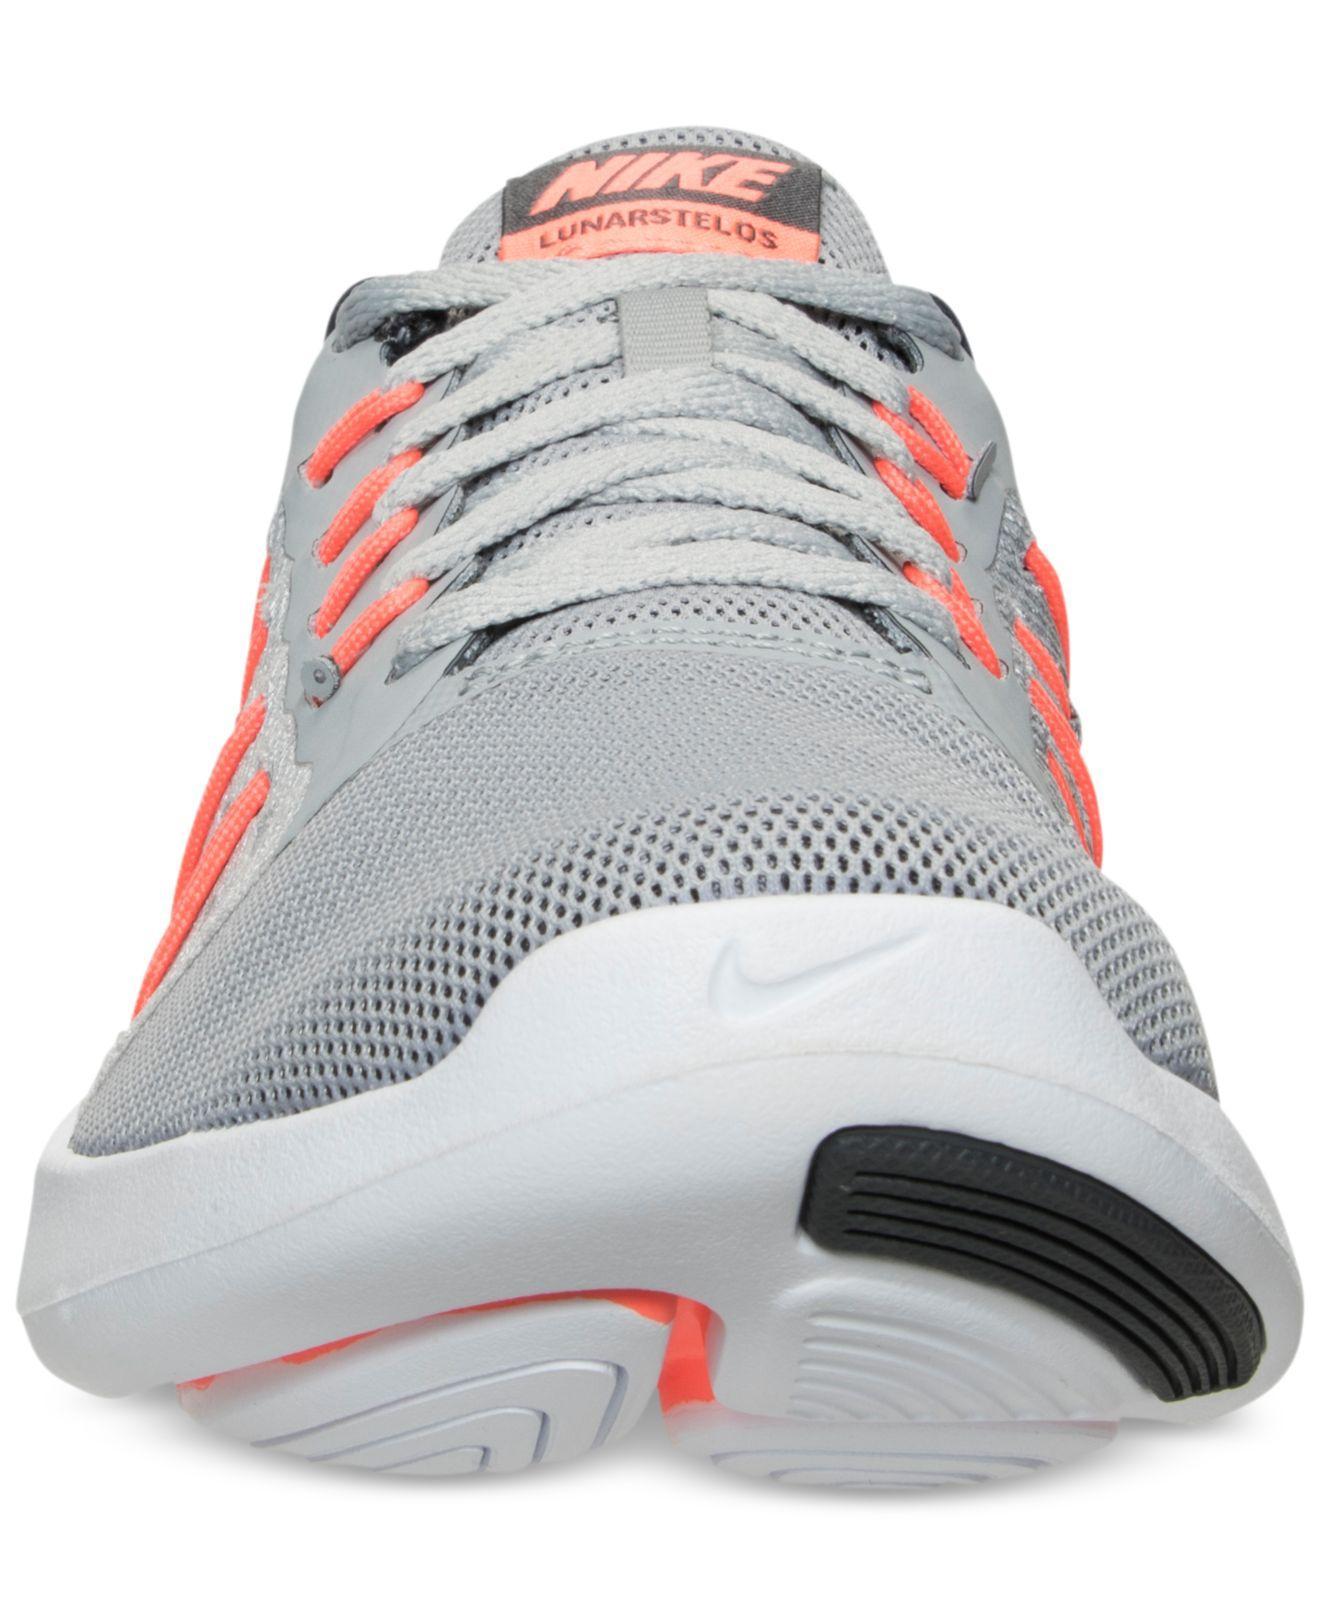 53be24cdb0f Lyst - Nike Women s Lunarstelos Running Sneakers From Finish Line in ...